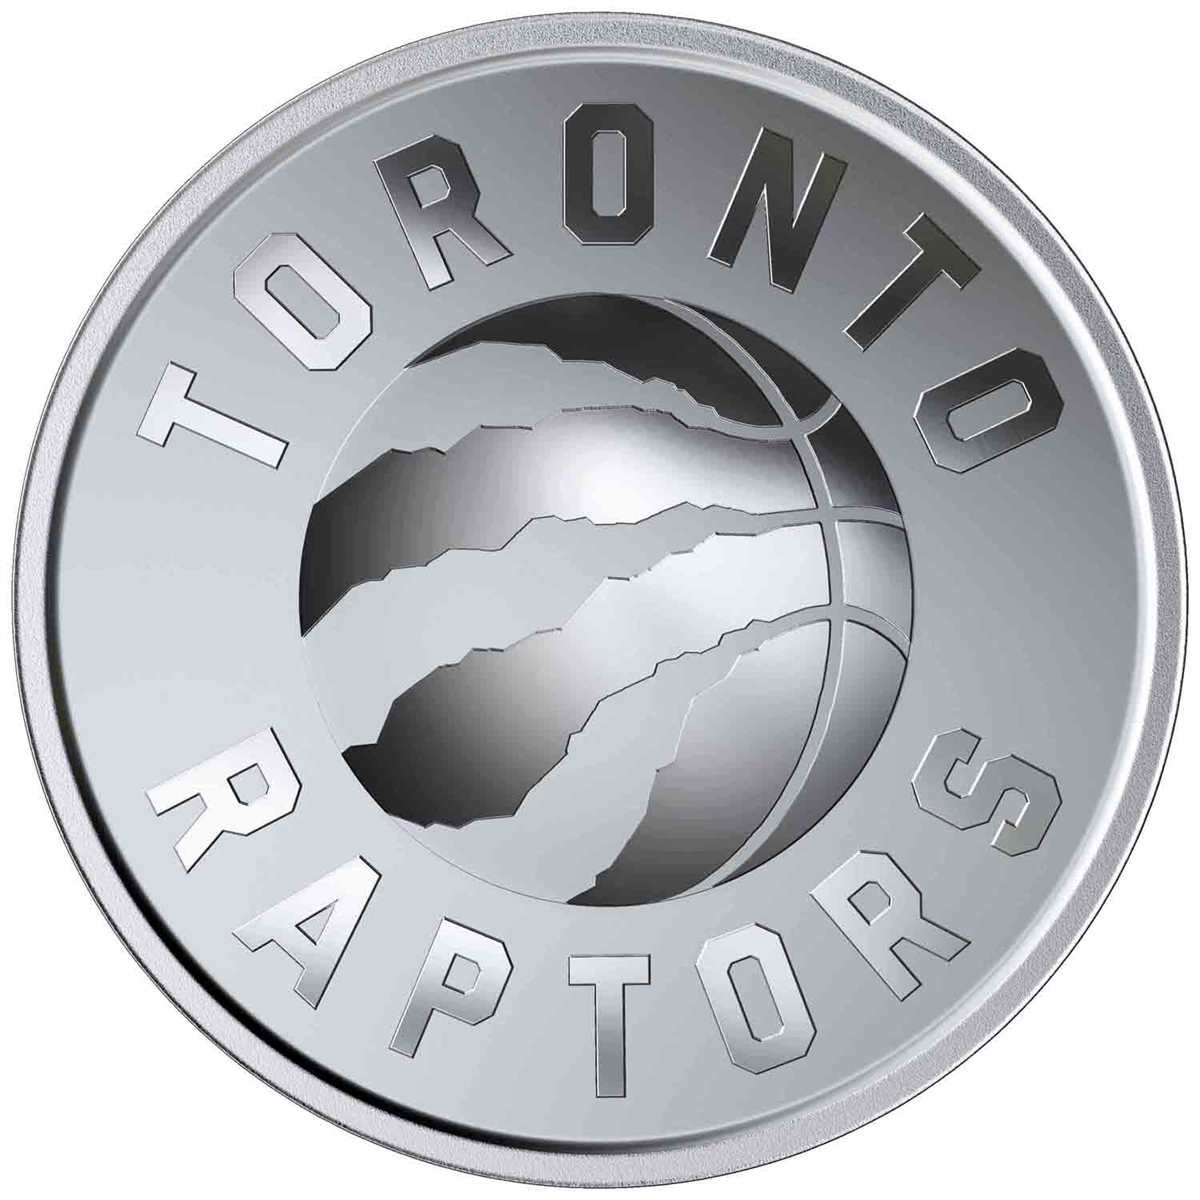 2020 25 CENT COIN TORONTO RAPTORS 25TH SEASON ROYAL CANADIAN MINT